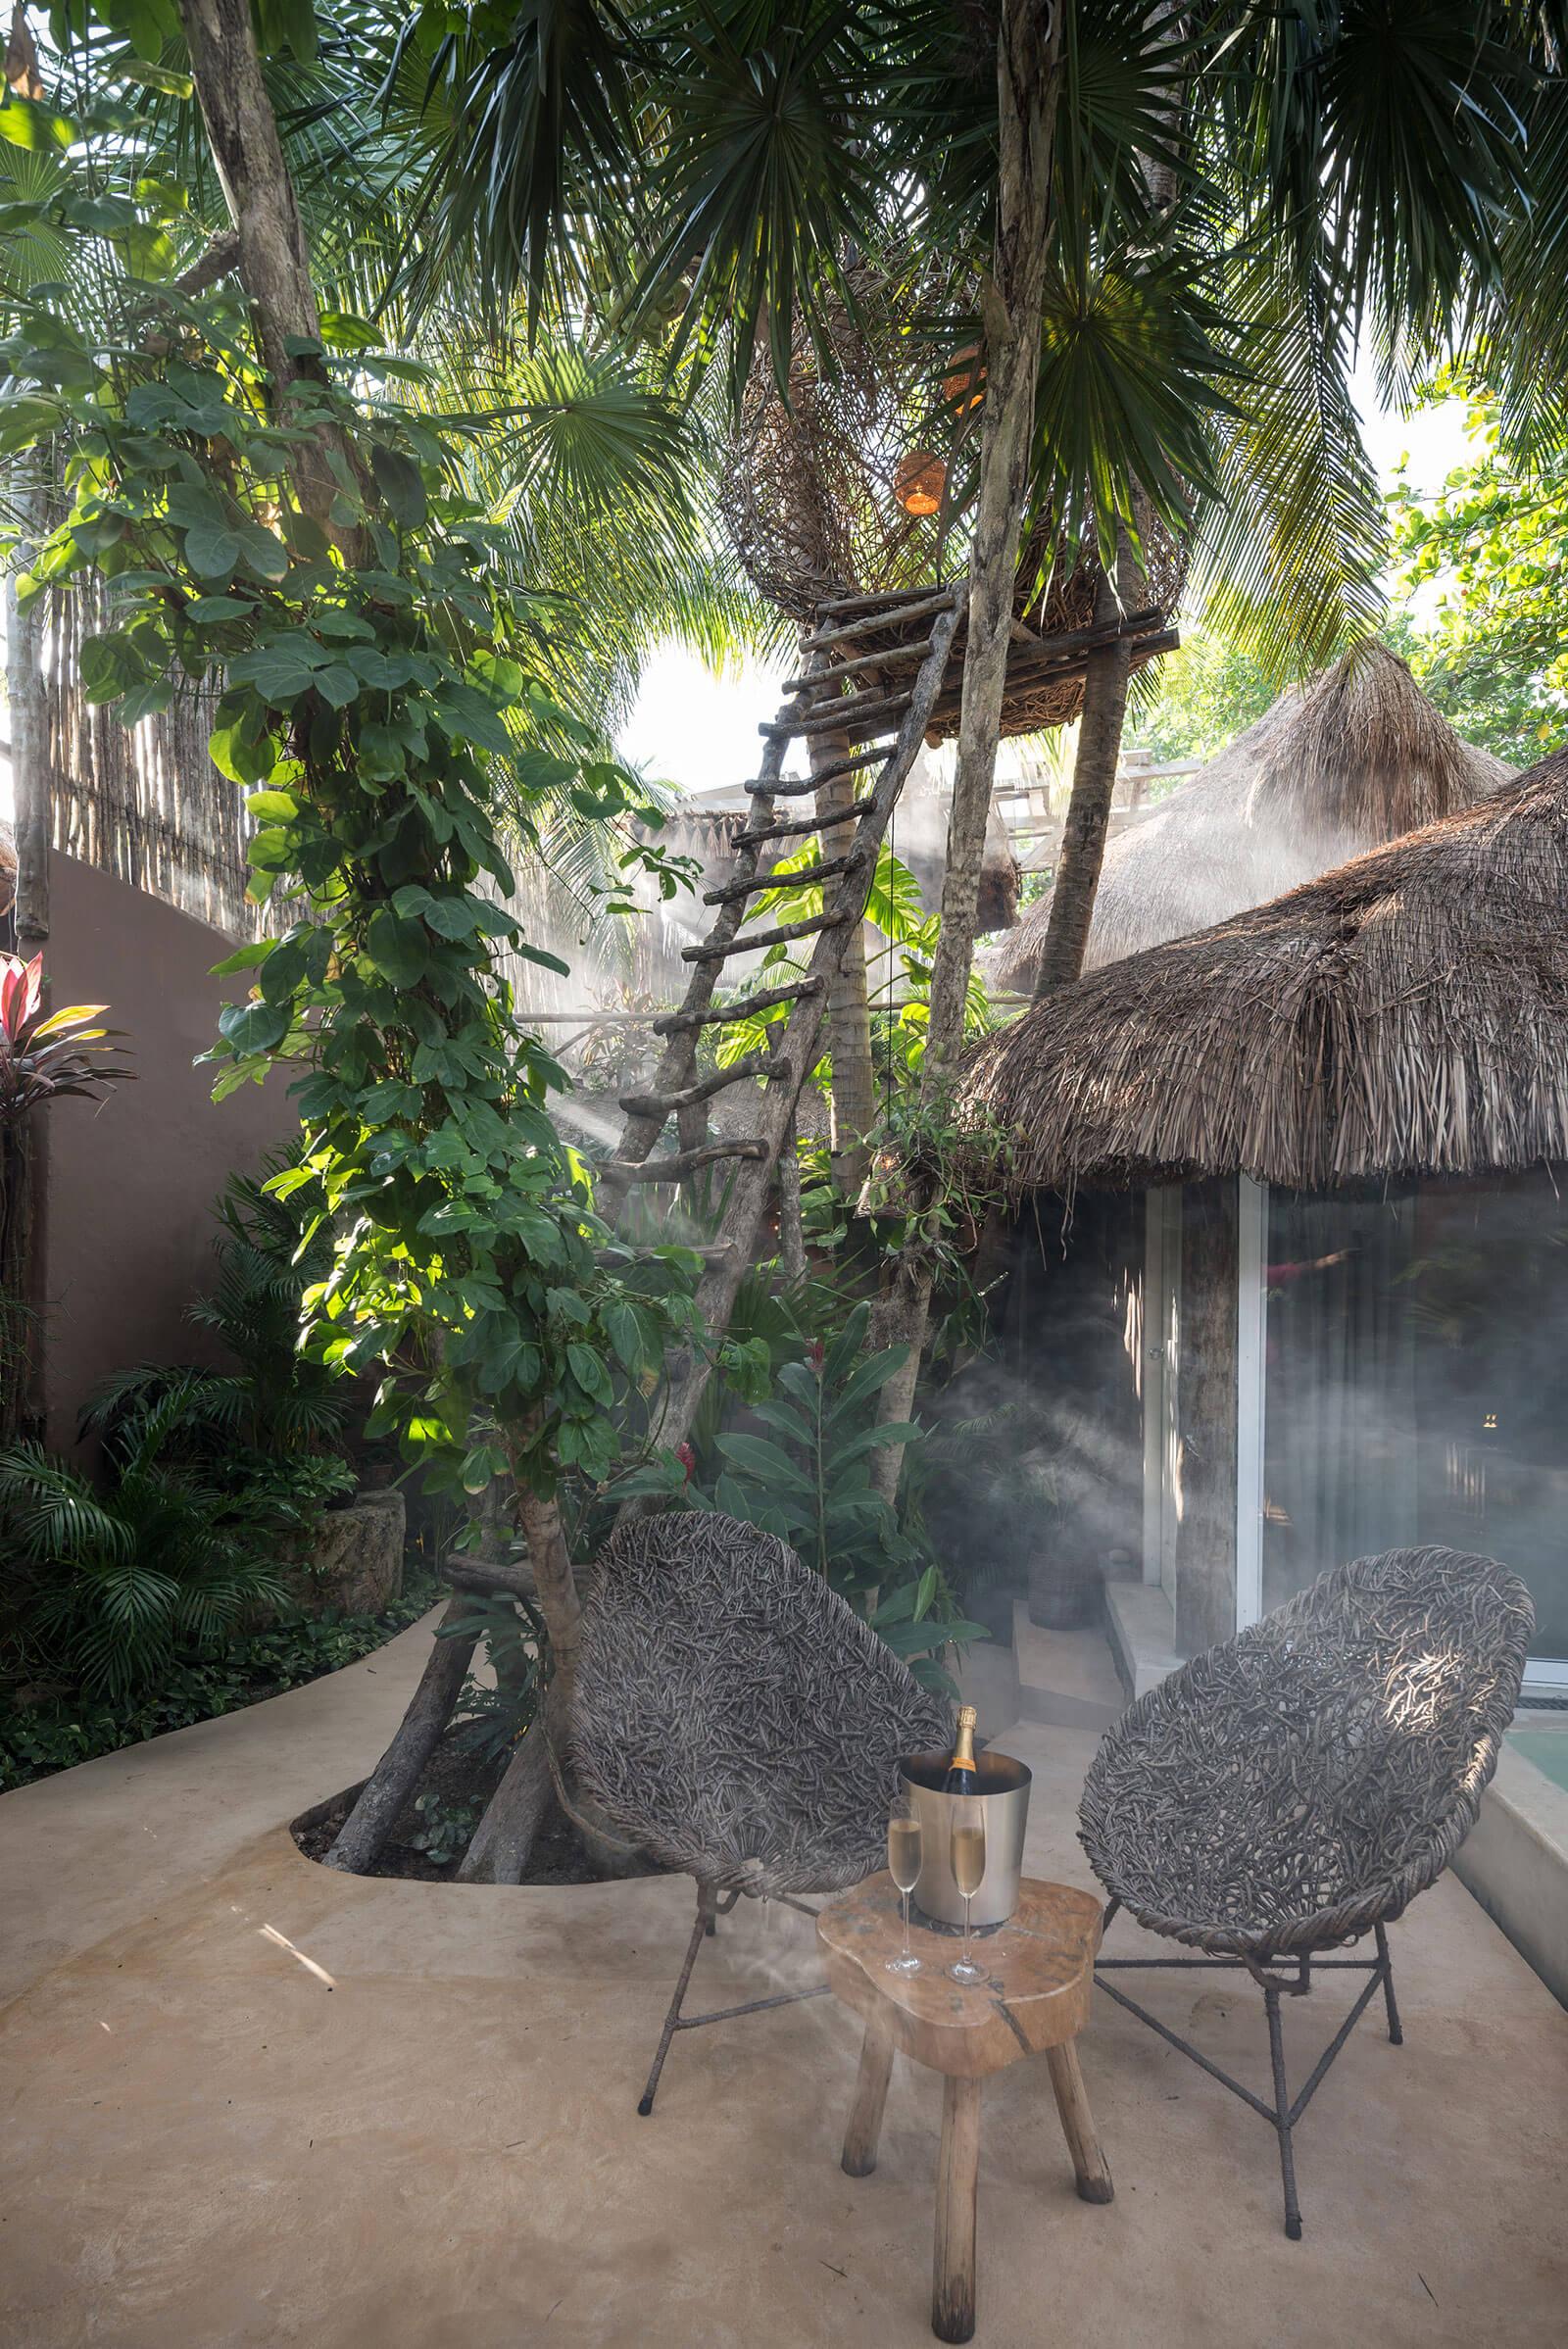 Maya_Luxe_Riviera_Maya_Luxury_Vacations_Villa_Rentals_Tulum_Playa_del_Carmen_Mexico_Bejuco_House_6.jpg